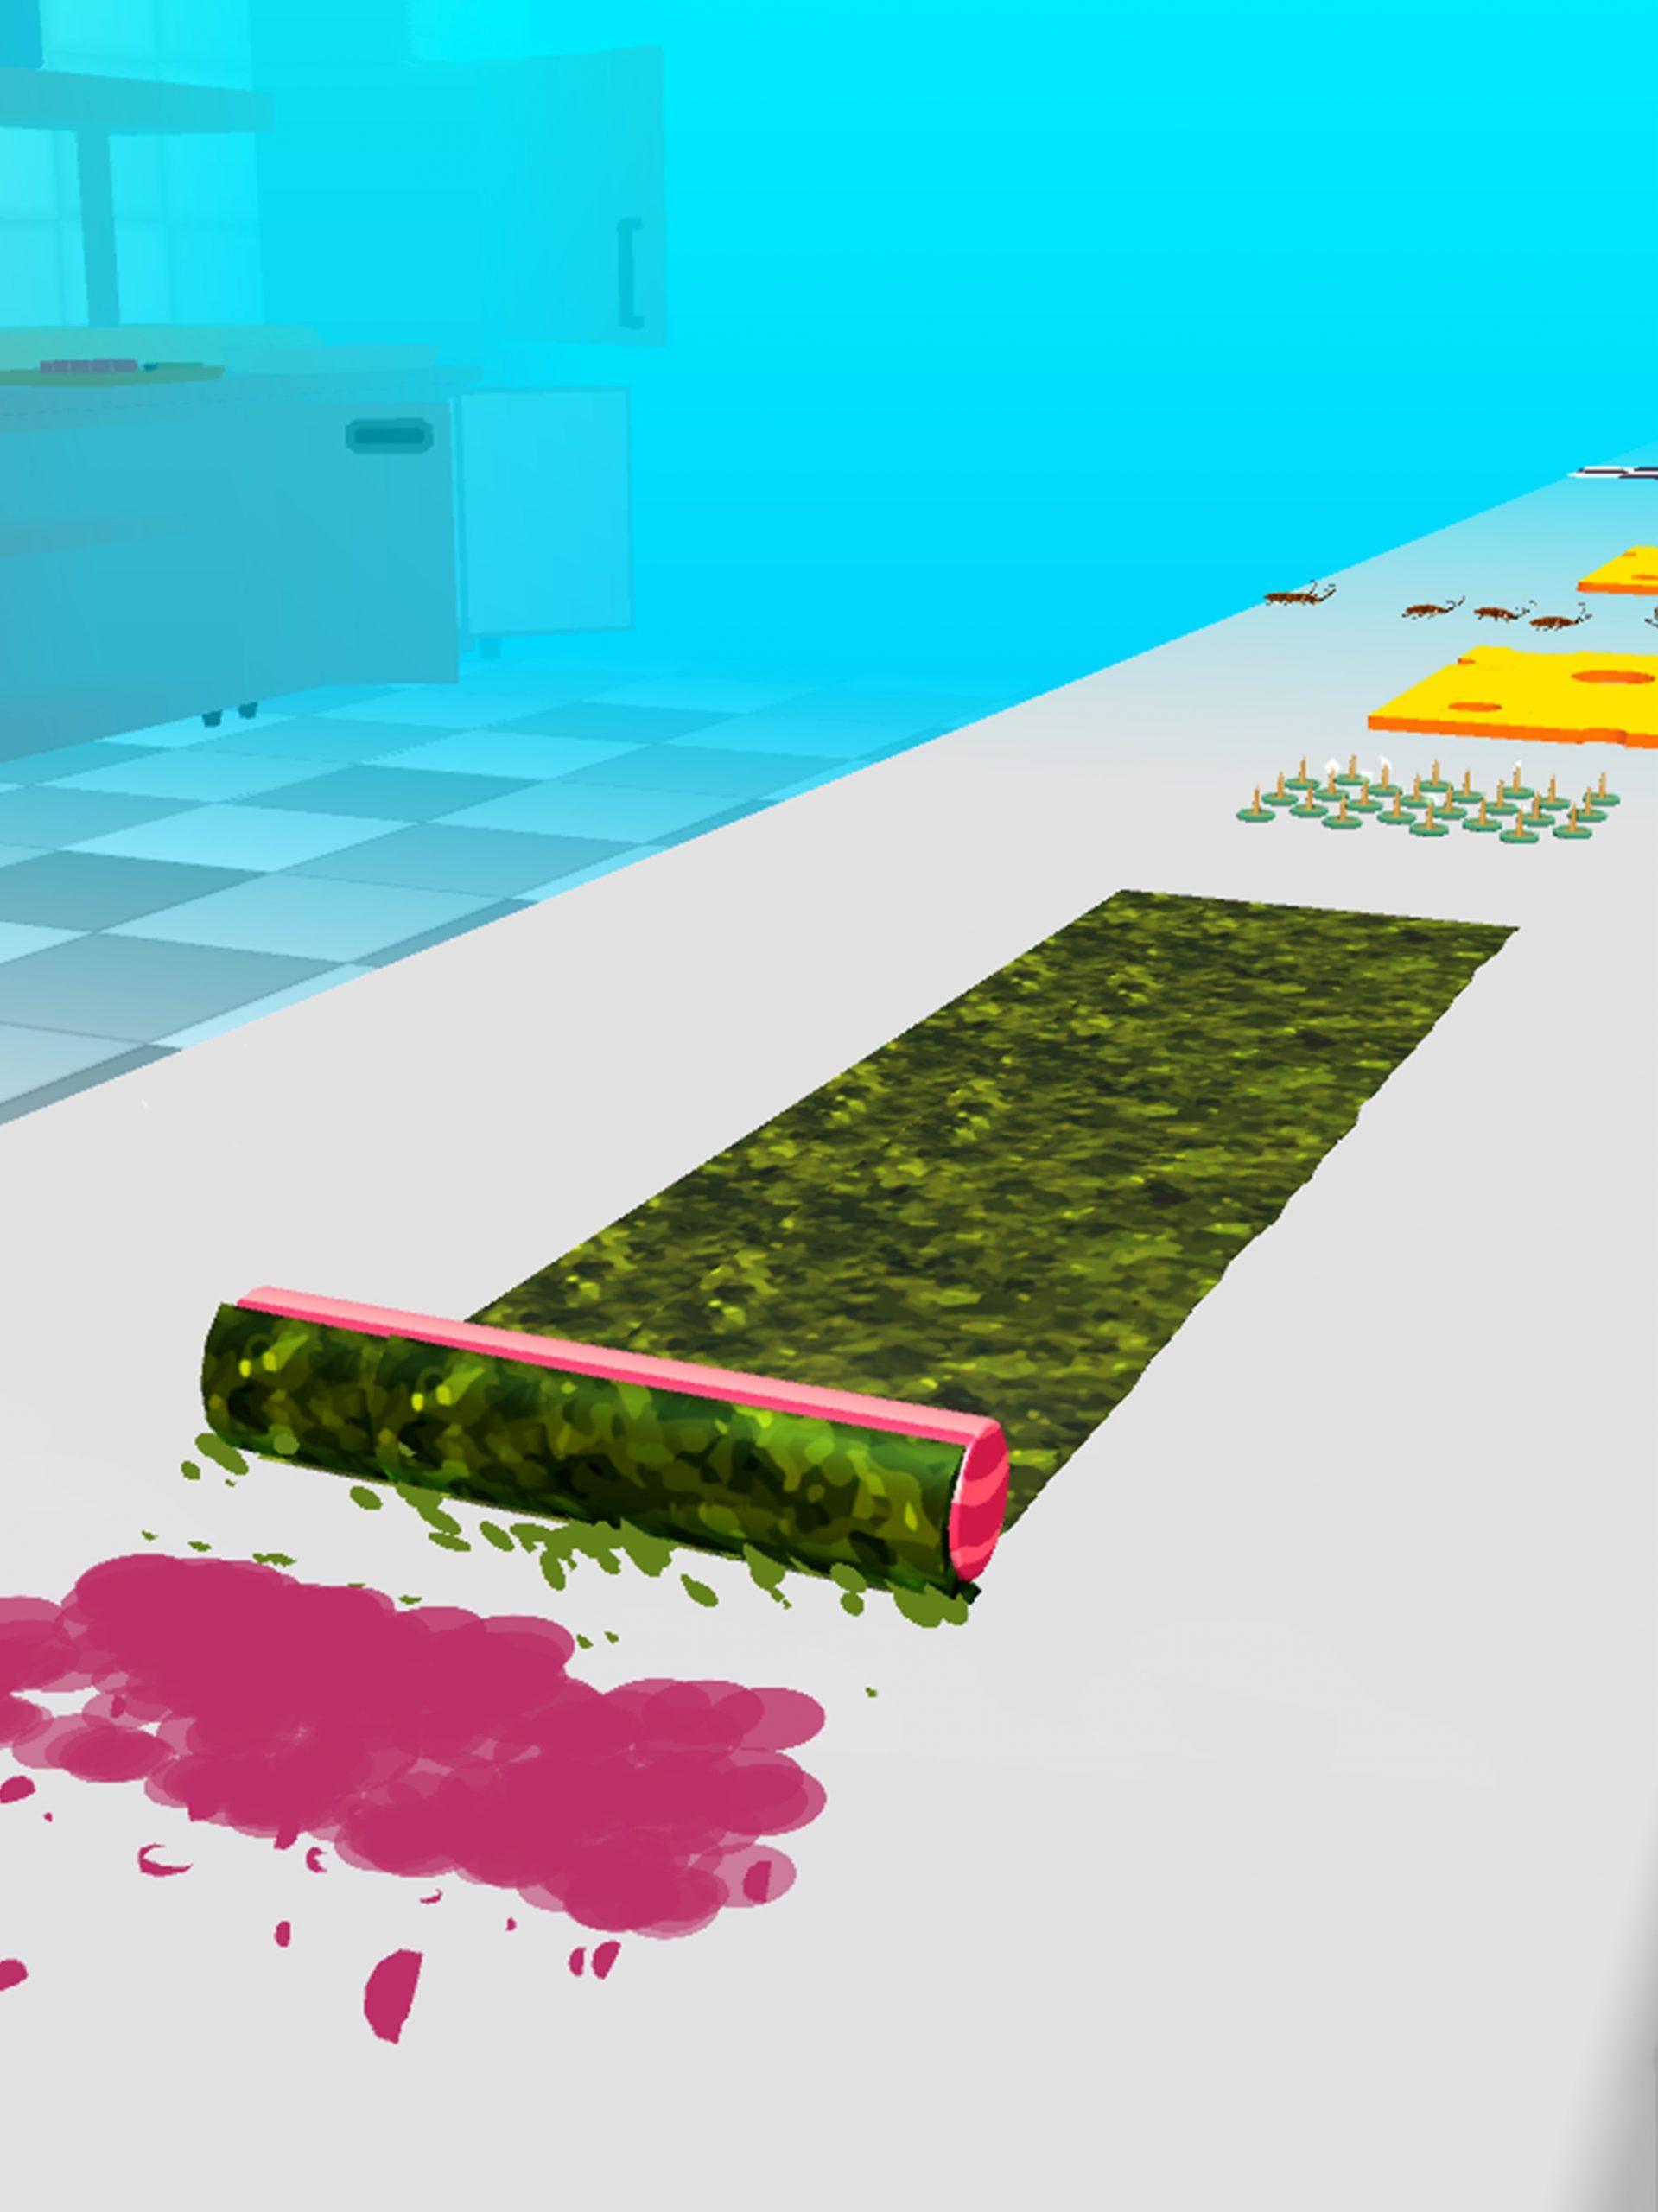 Sushi Roll 3Dってどんなアプリ?ハイパーカジュアルゲームをプレイレビュー!